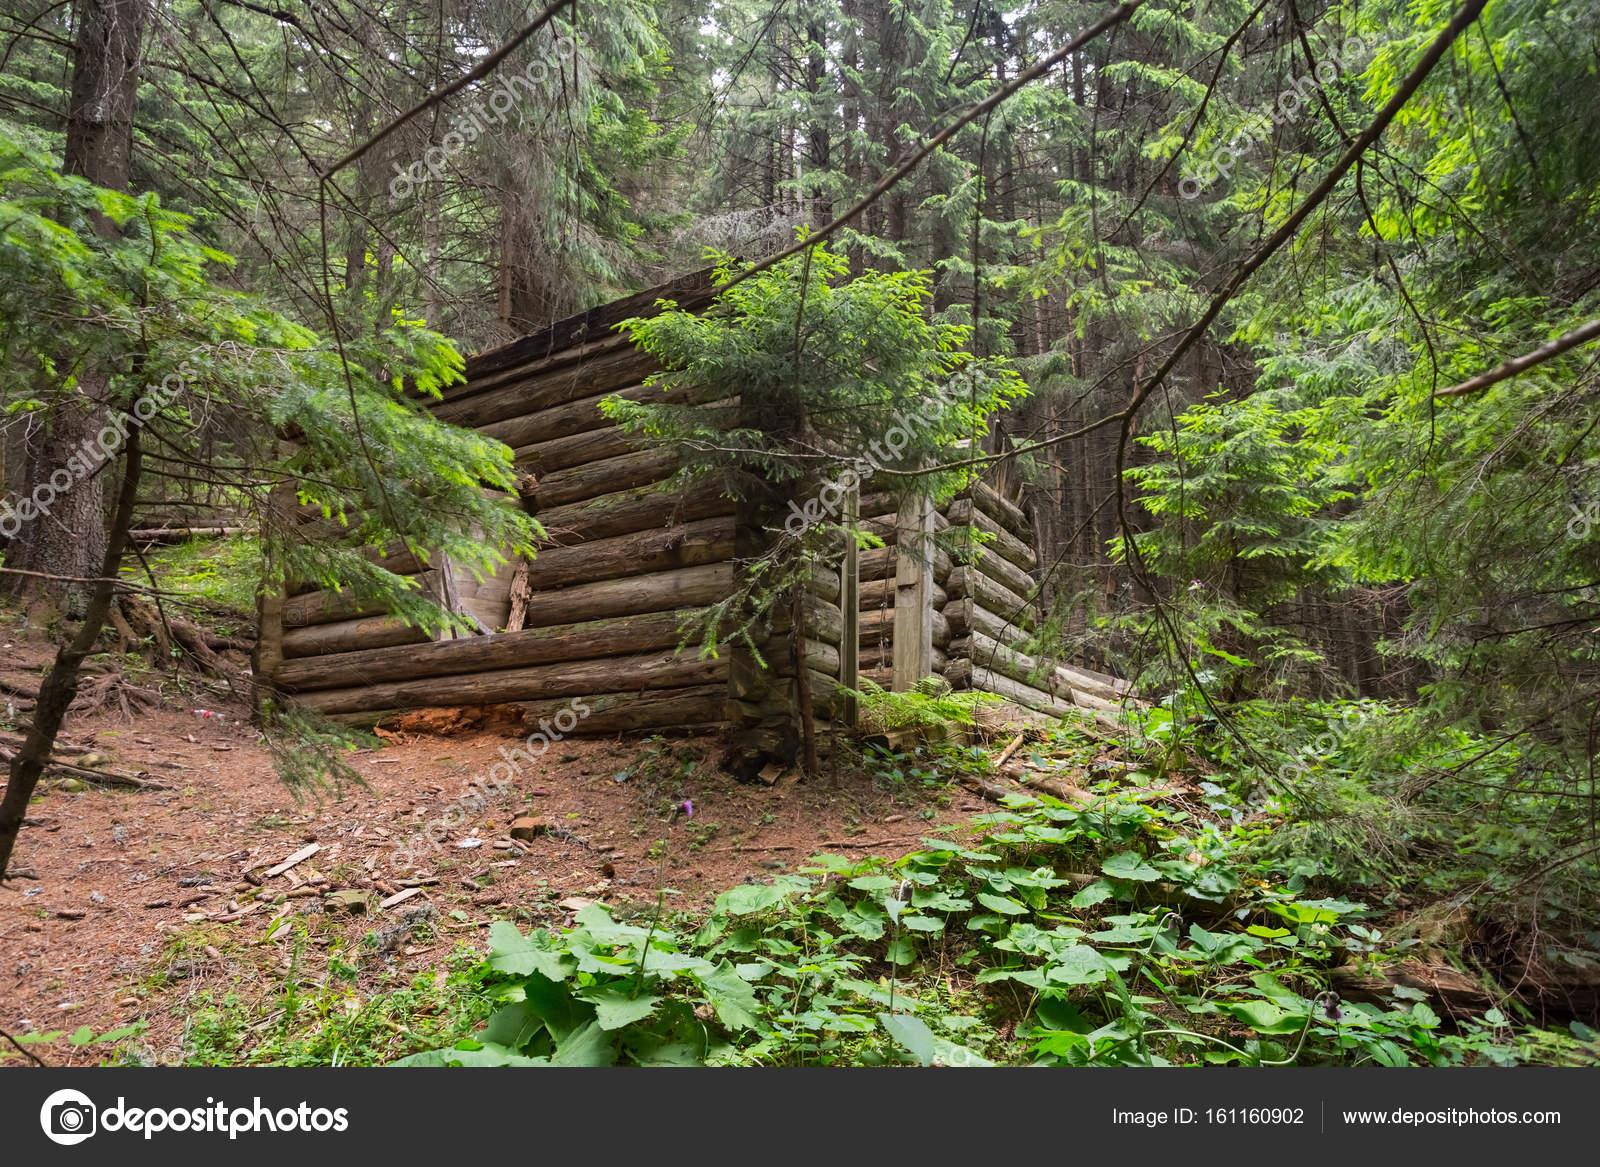 kleines verlassenes holzhaus im wald stockfoto york 76 161160902. Black Bedroom Furniture Sets. Home Design Ideas